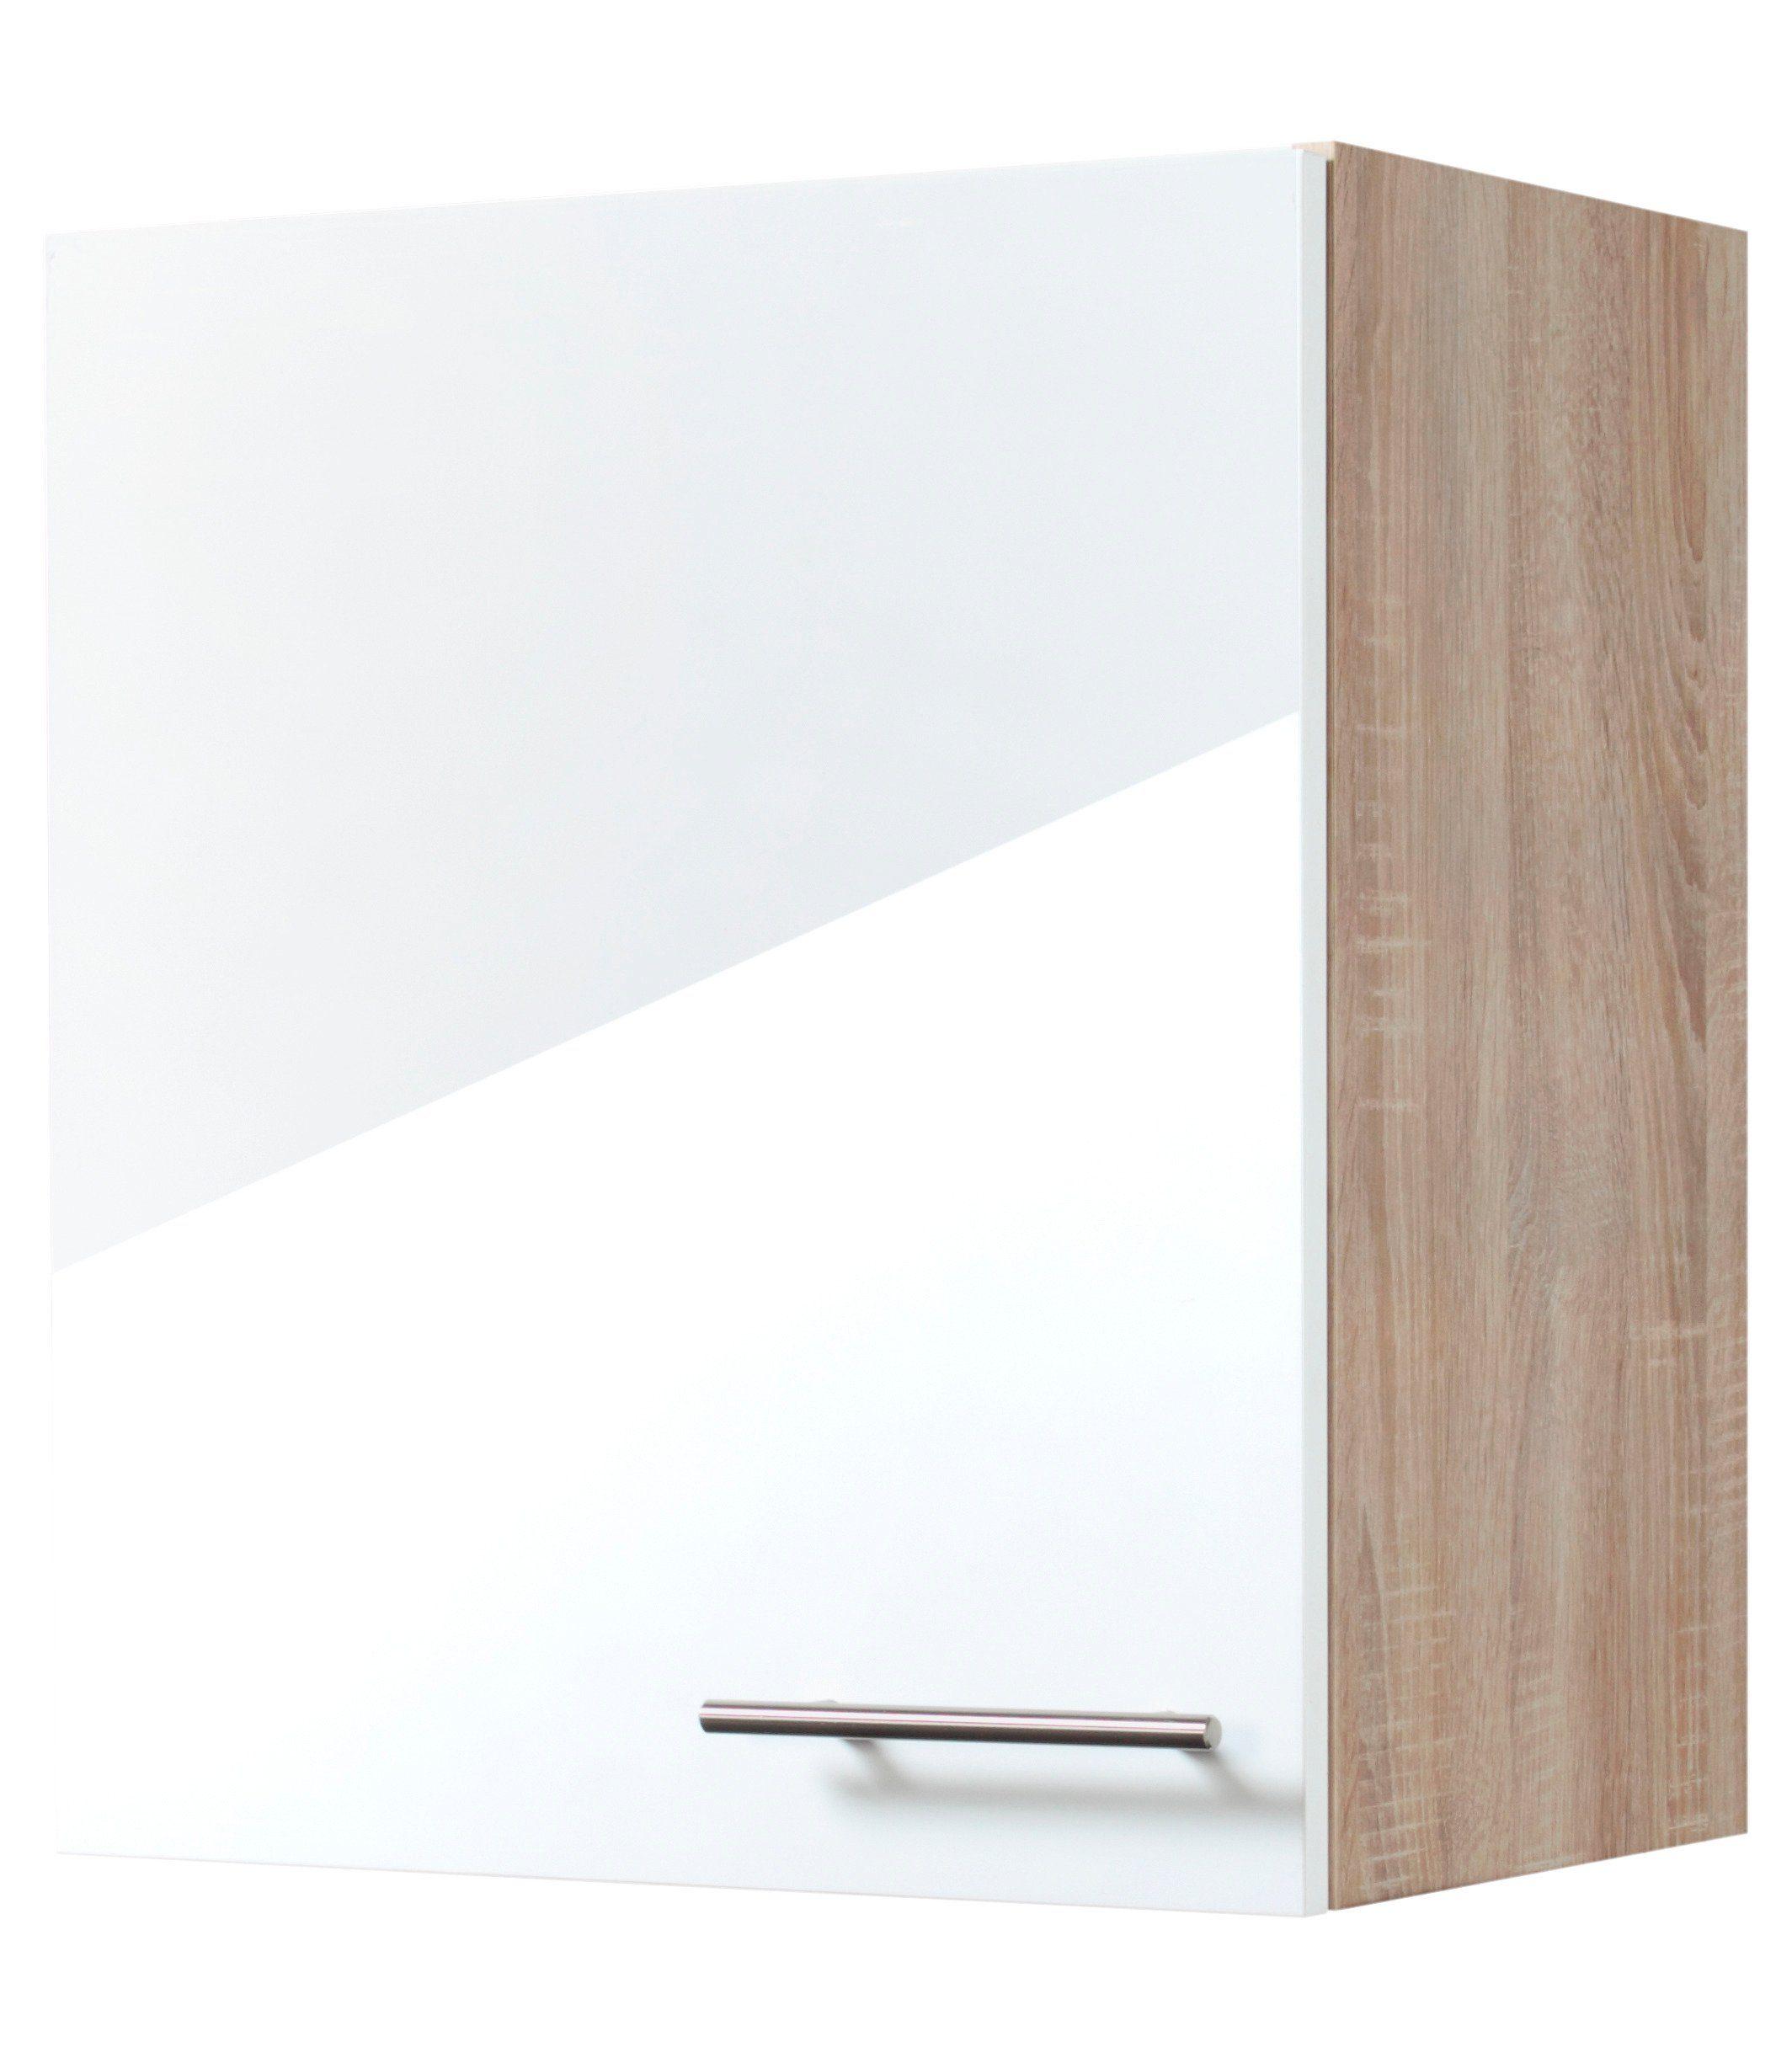 OPTIFIT Küchenhängeschrank »Dakar, Breite 60 cm«